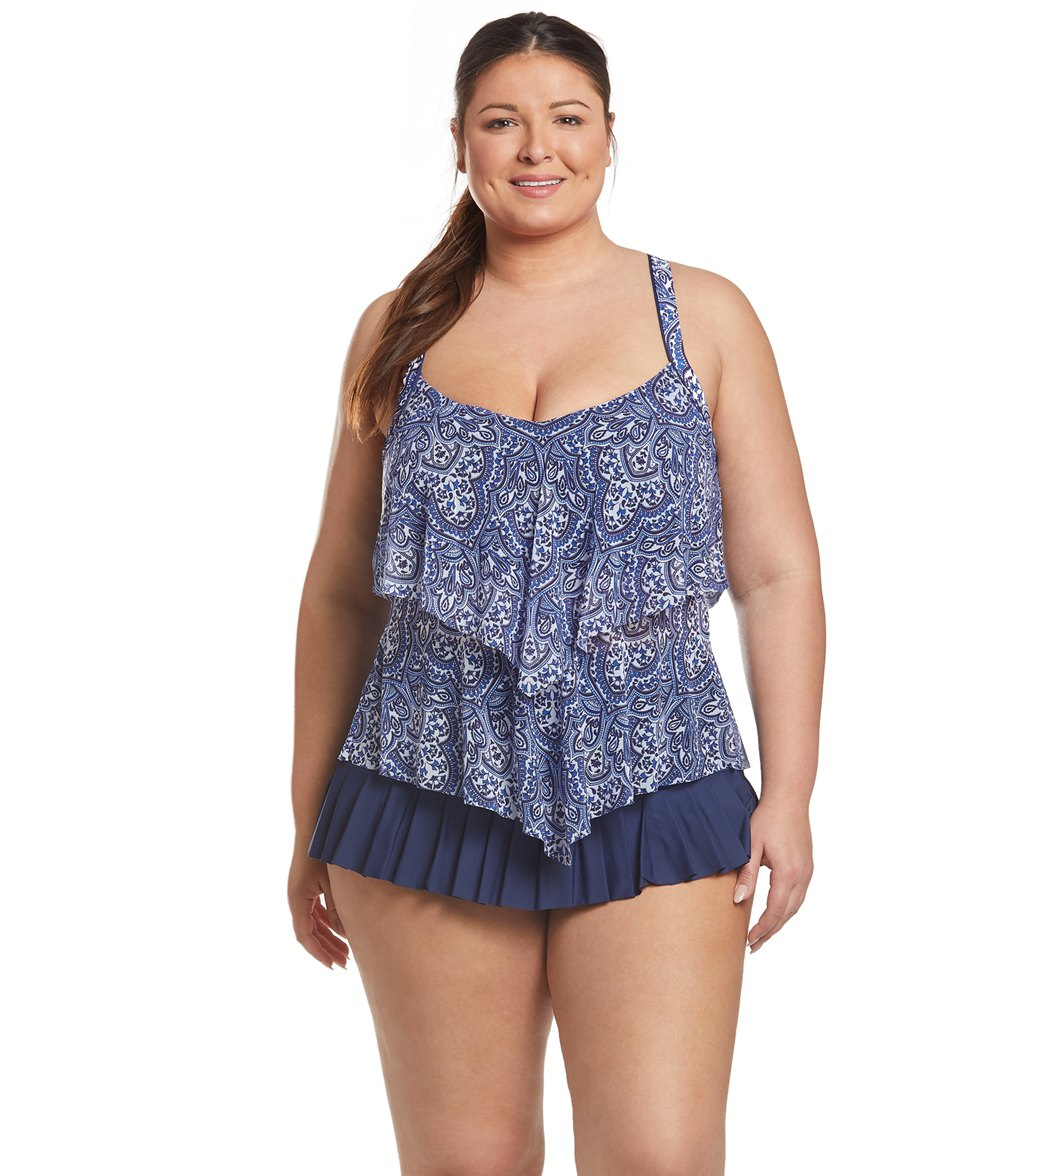 bd5c8067313 Beach House Plus Size Paloma Beach Sophie Pleated Swim Skirt at ...